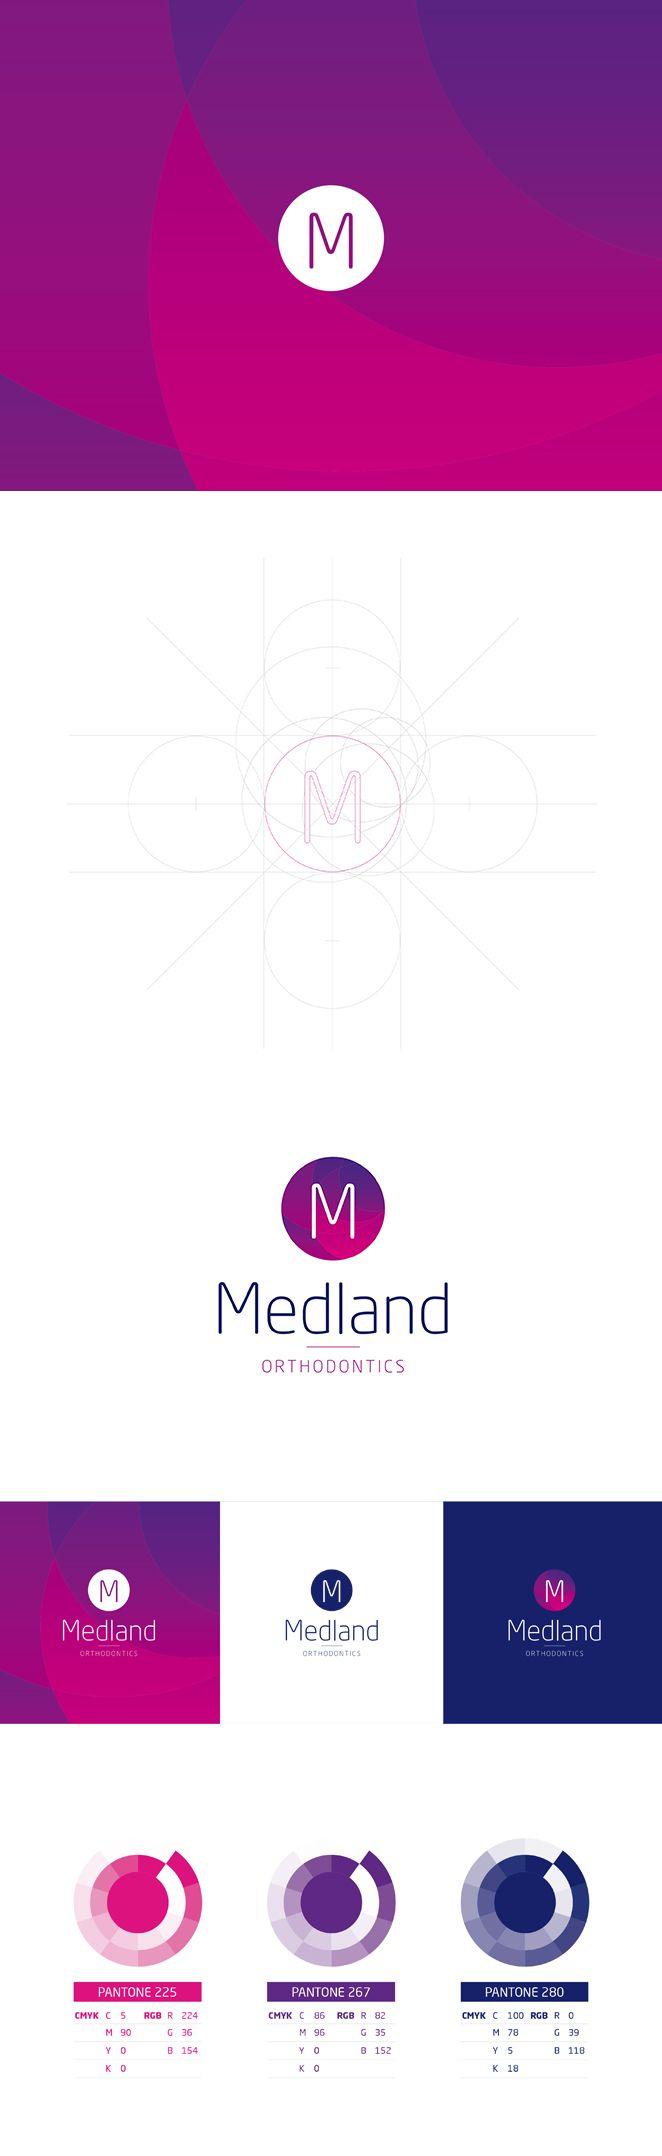 Medland Orthodontics Rebrand by Csquared Design